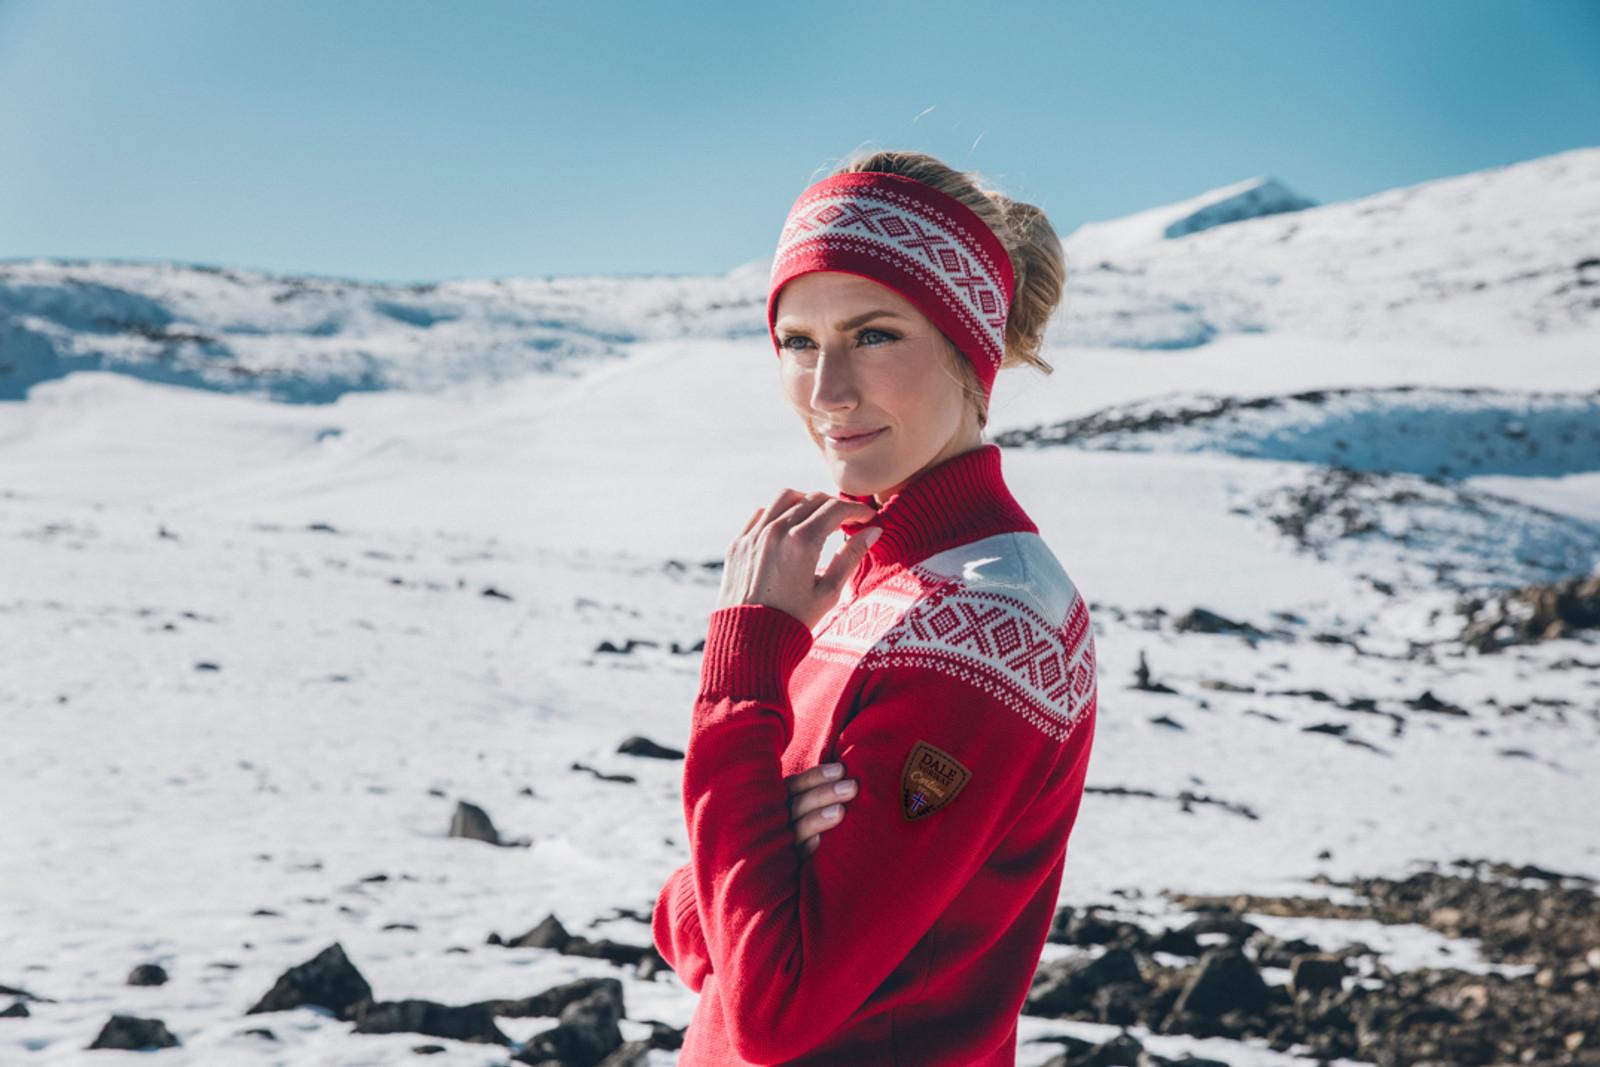 Woman wearing Dale of Norway's Cortina headband in Raspberry/Off White, 25014-B, with ladies Cortina sweater in Raspberry/Off-White, 93811-B.